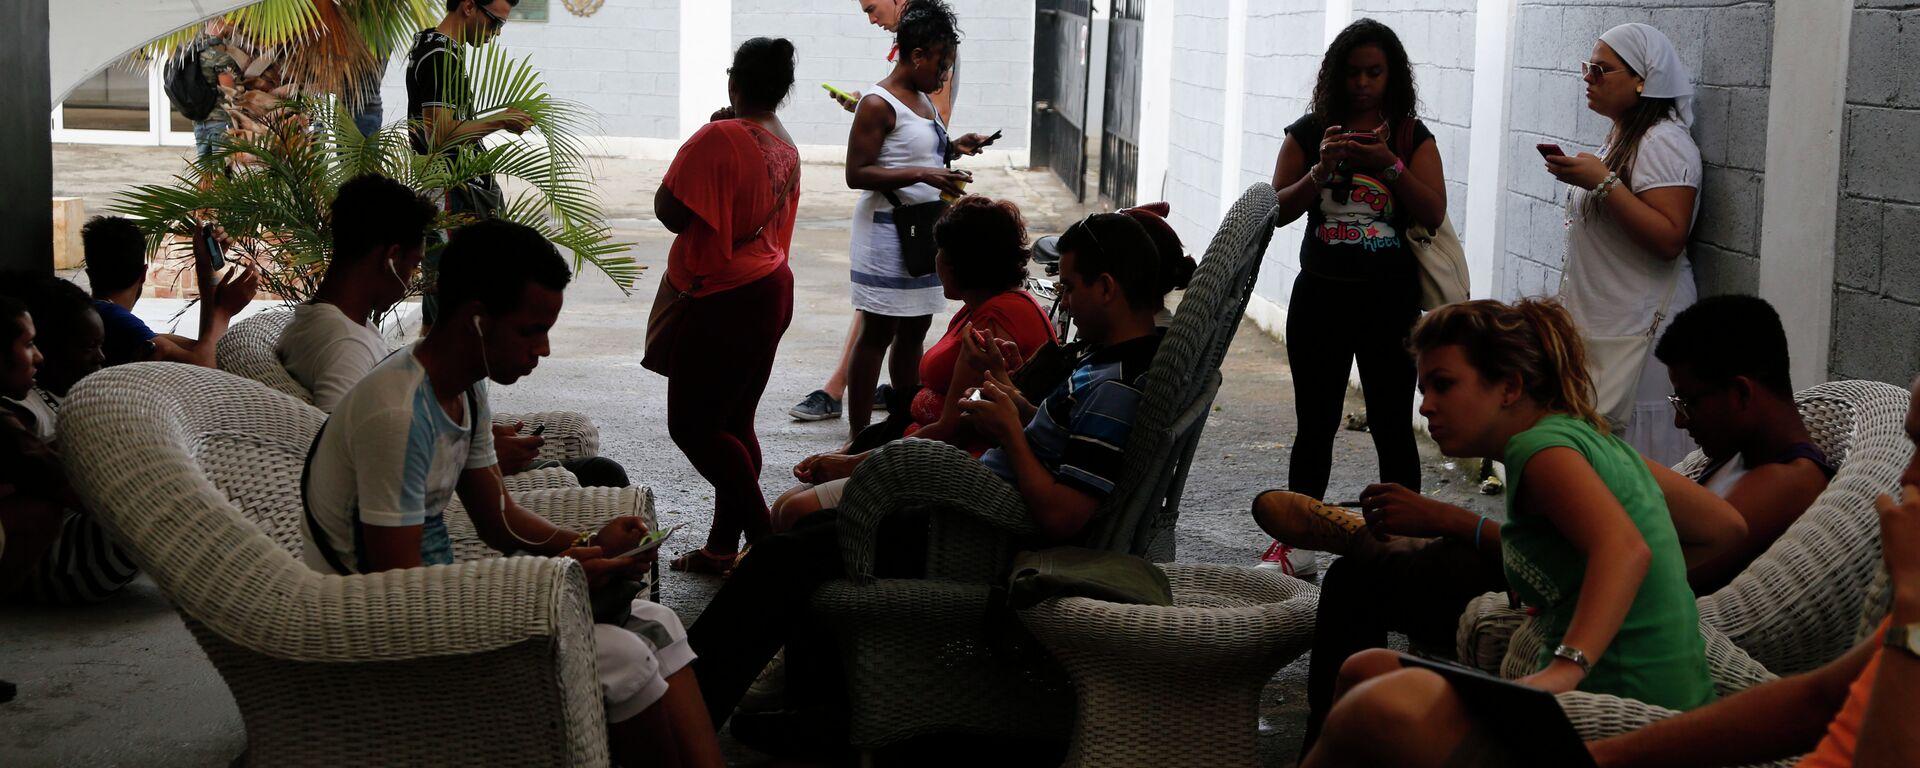 People use a free Wi-Fi network at a center run by famed artist Kcho, in Havana, Cuba, Wednesday, March 11, 2015.  - Sputnik Mundo, 1920, 11.08.2021